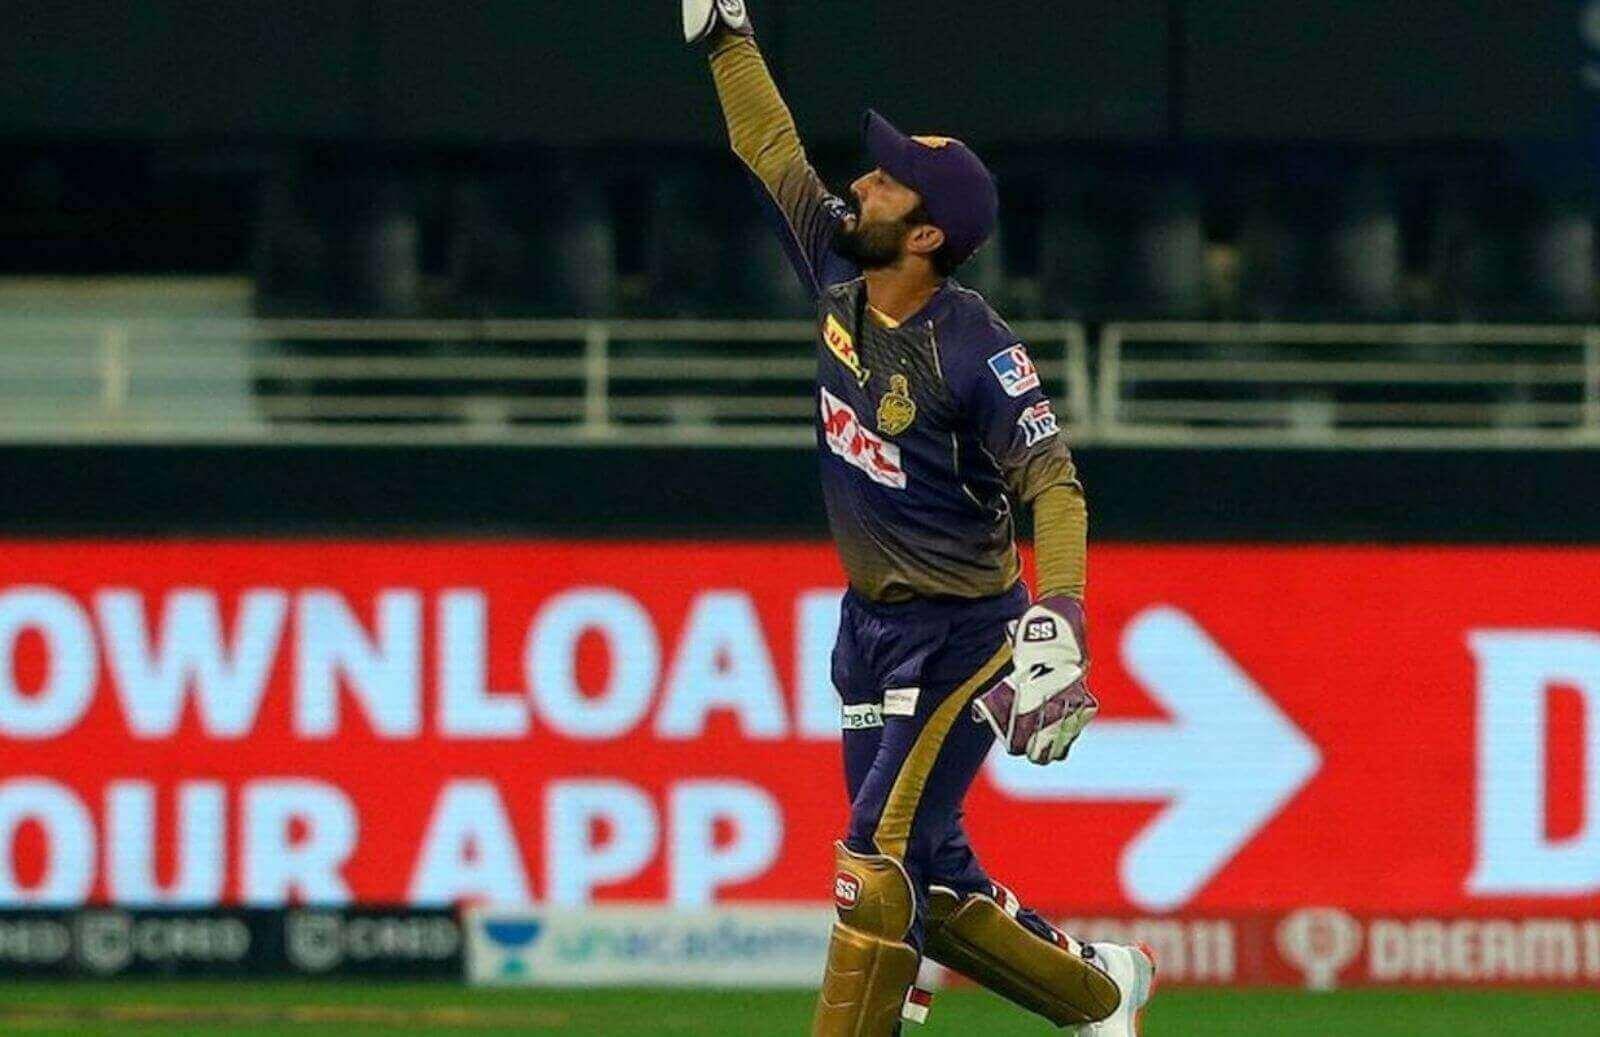 Dinesh Karthik Takes A World-Class Catch To Dismiss Rajasthan Royals Opener Ben Stokes